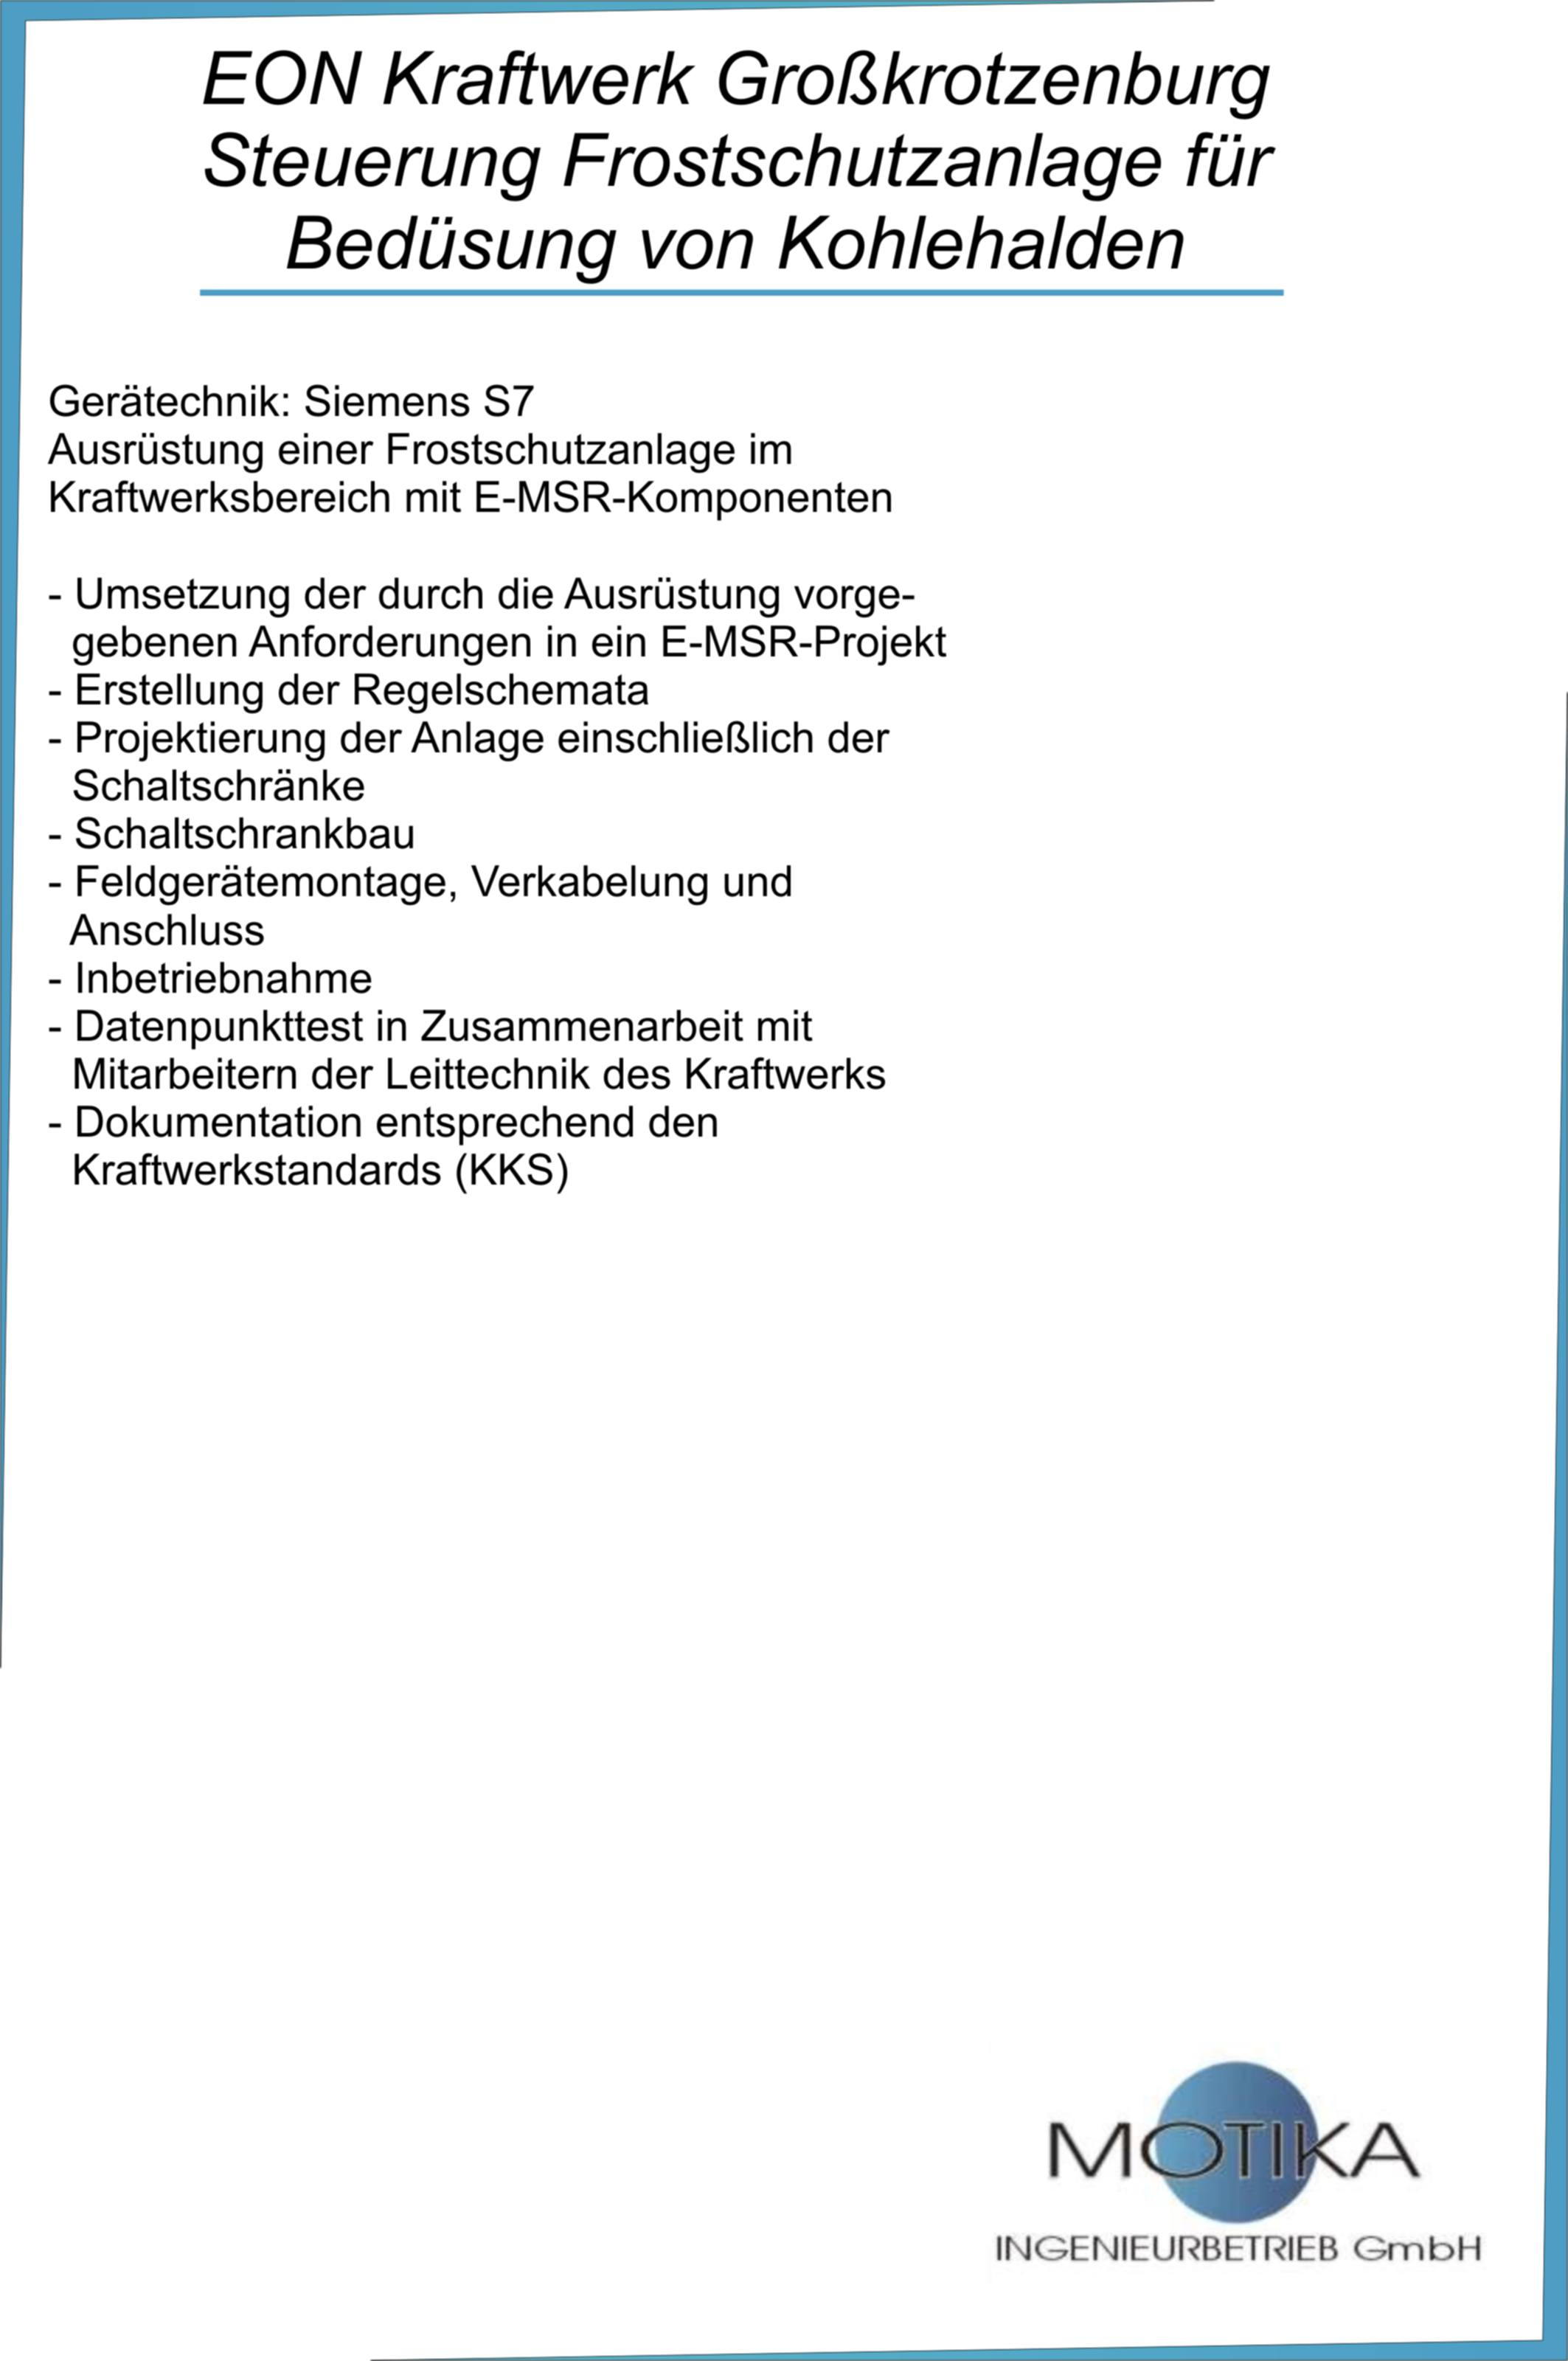 Wunderbar Projektblatt Vorlage Galerie - Entry Level Resume Vorlagen ...